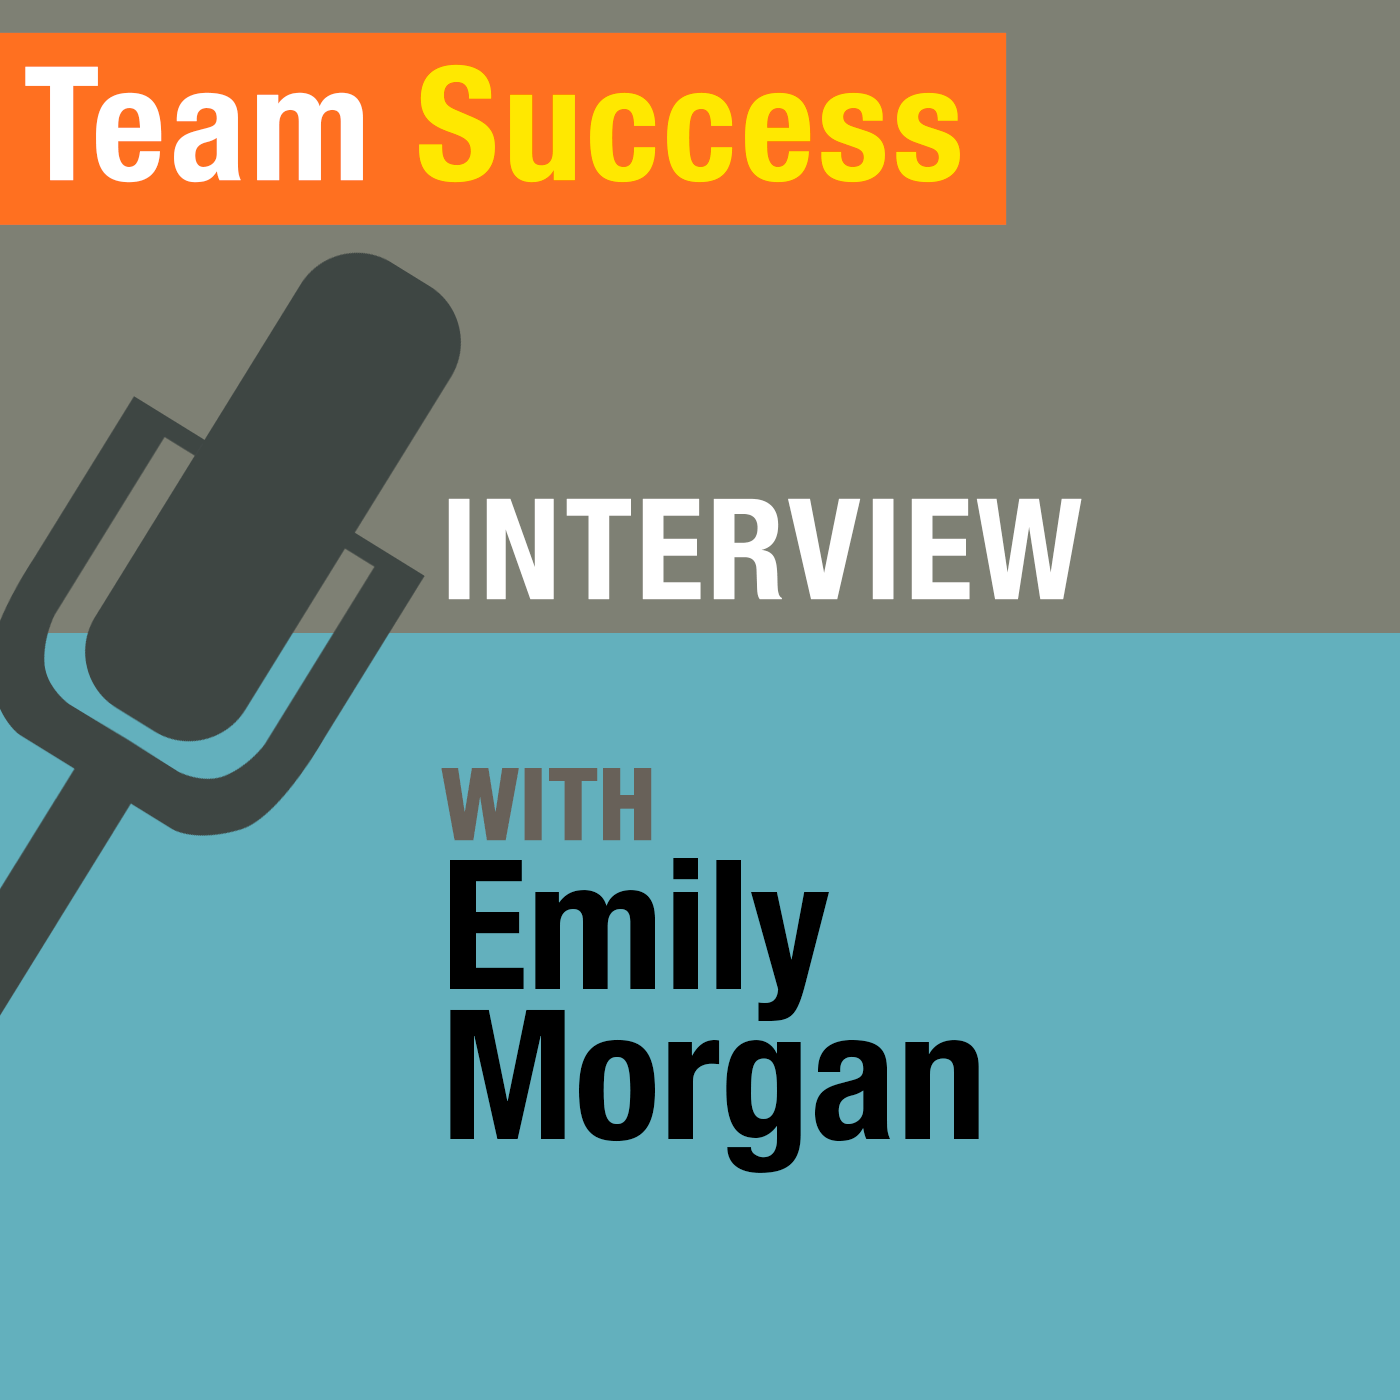 INTERVIEW-emily-morgan-1